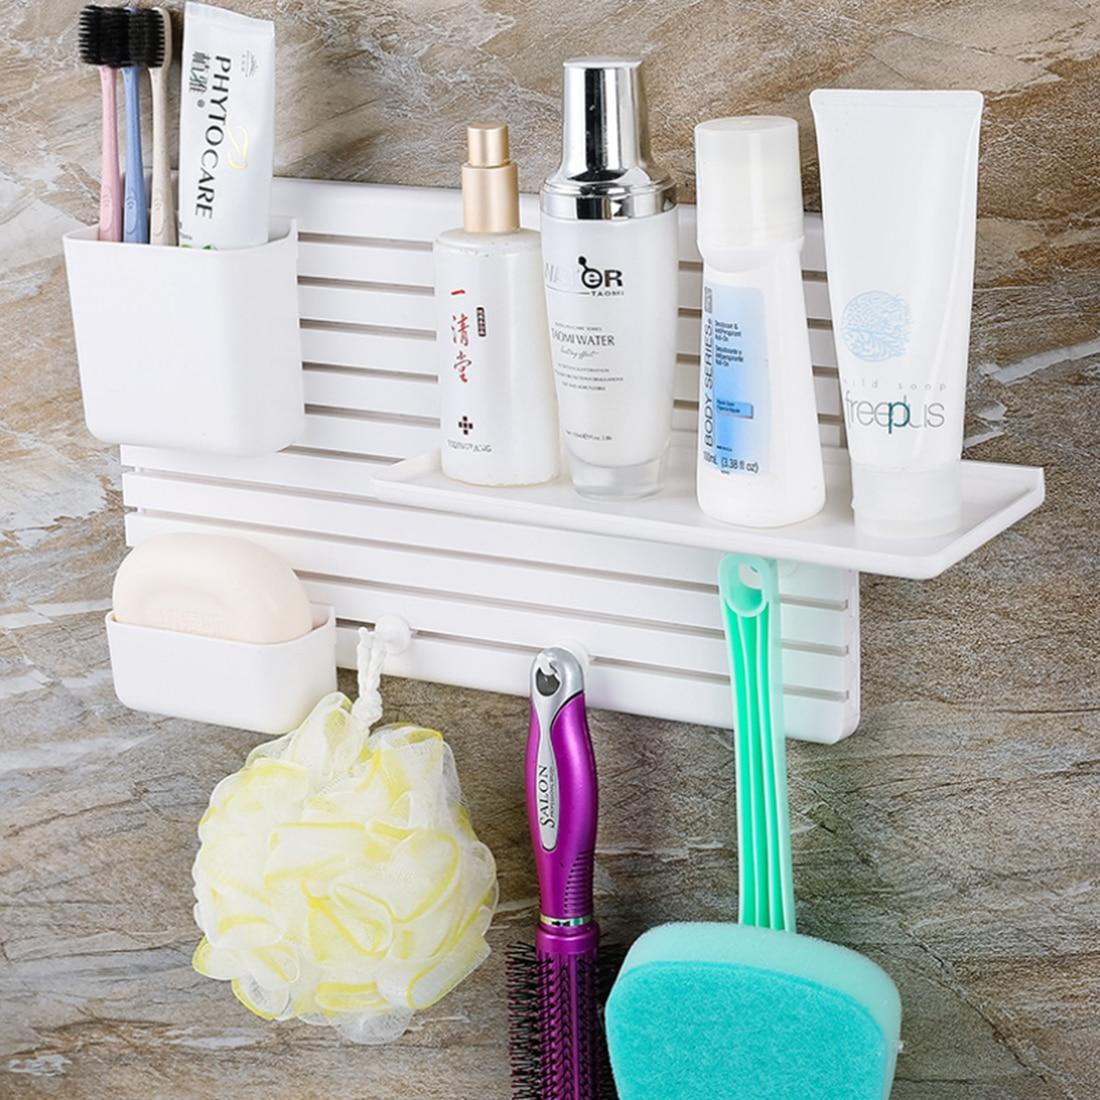 Creative Stickup Plastic Wall Hanger Rack Durable Bathroom Kitchen DIY Storage Rack Home Storage Organization White